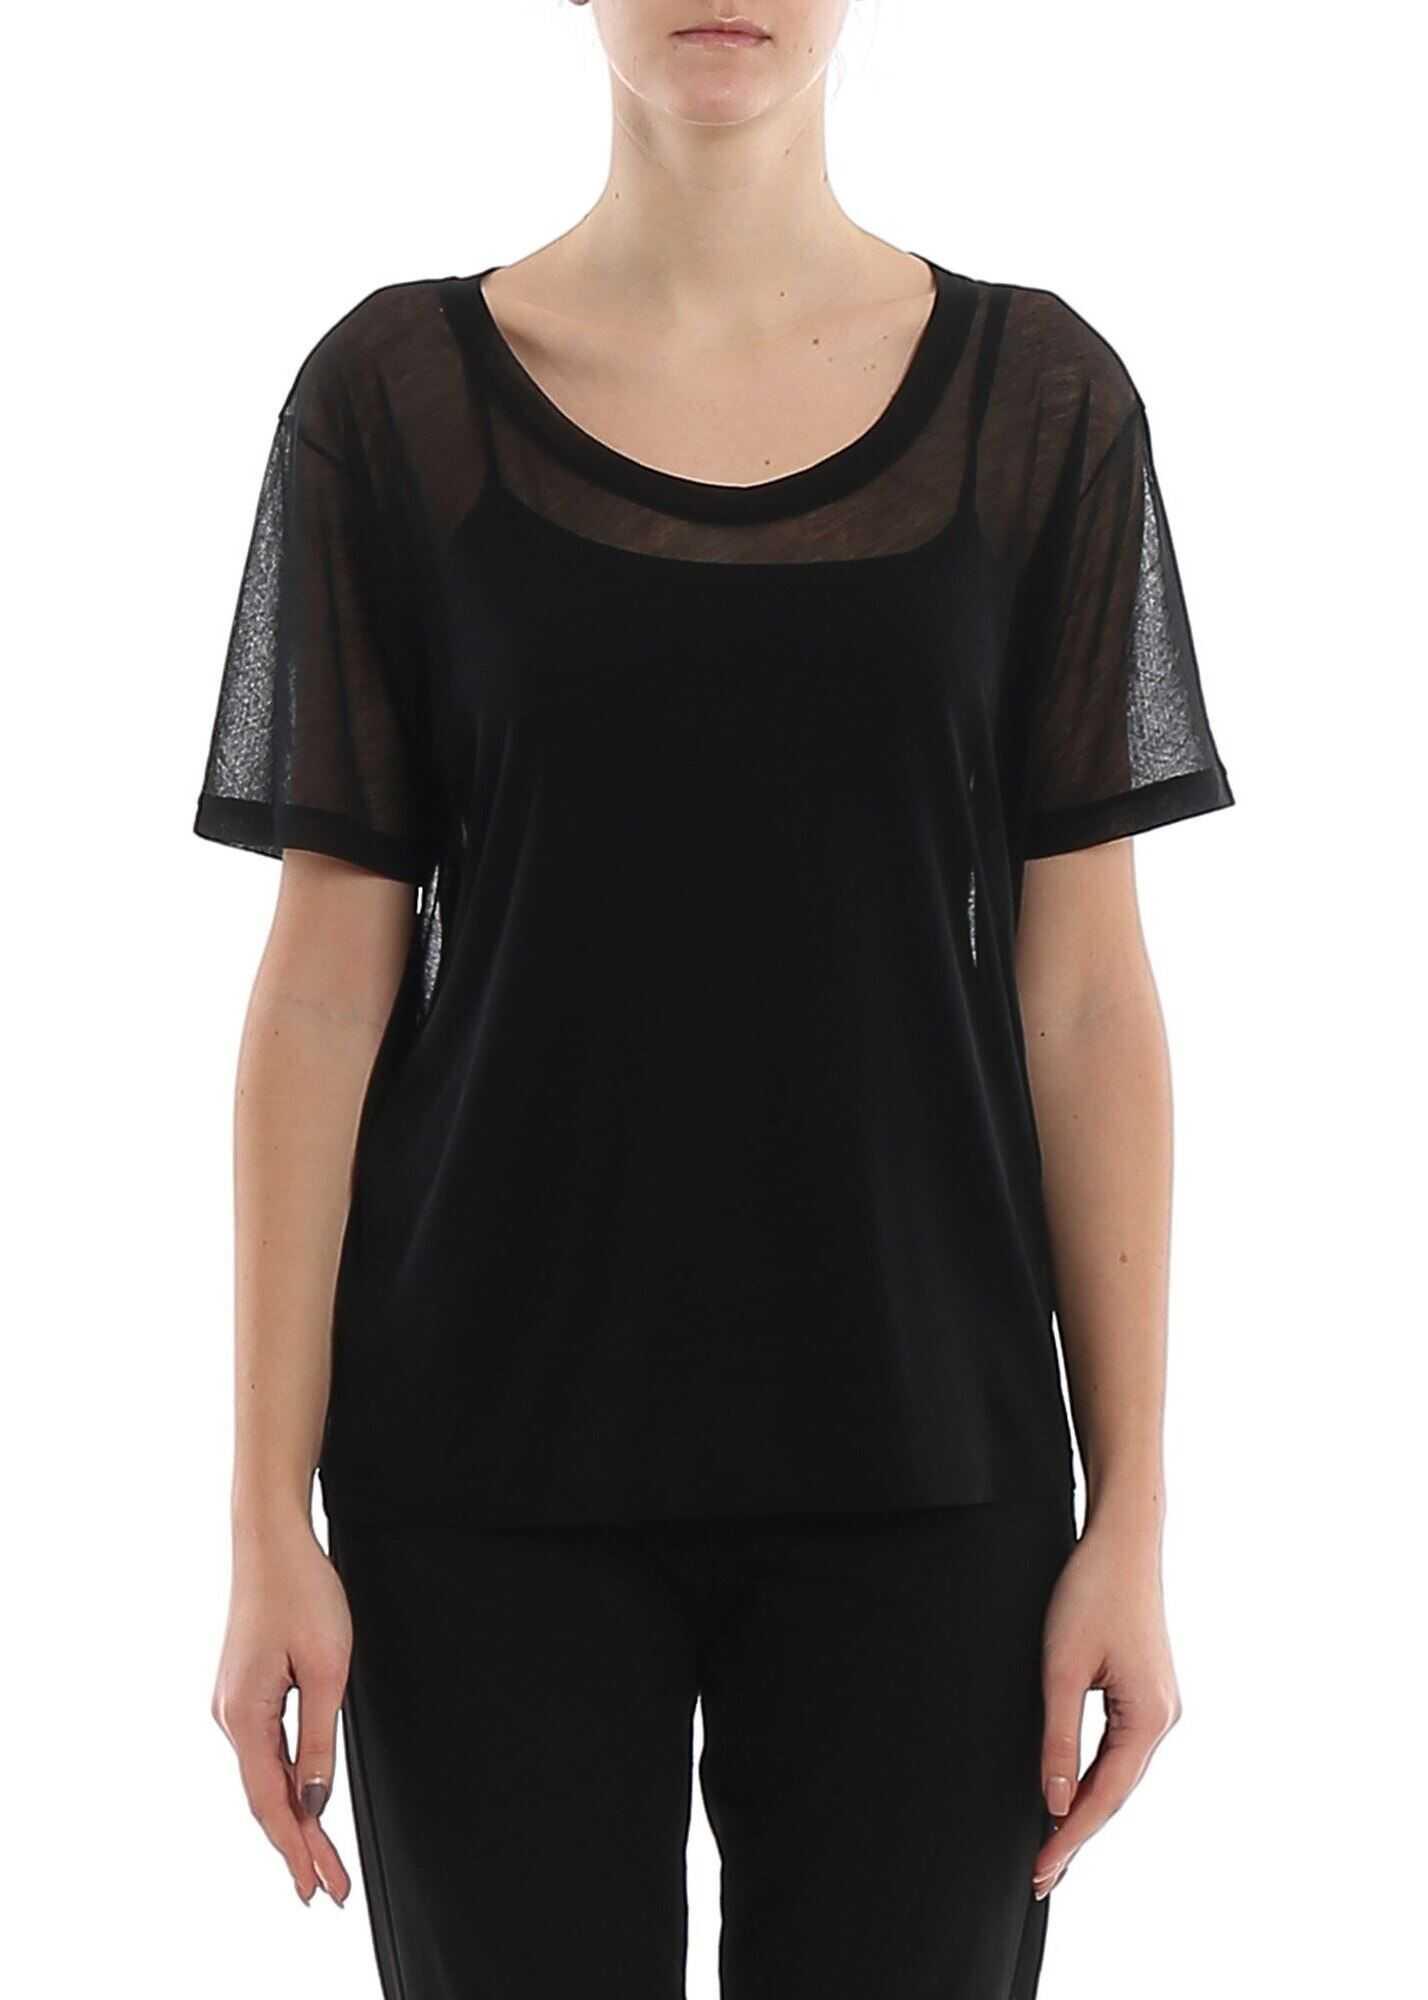 Saint Laurent Black Lightweight Cotton T-Shirt Black